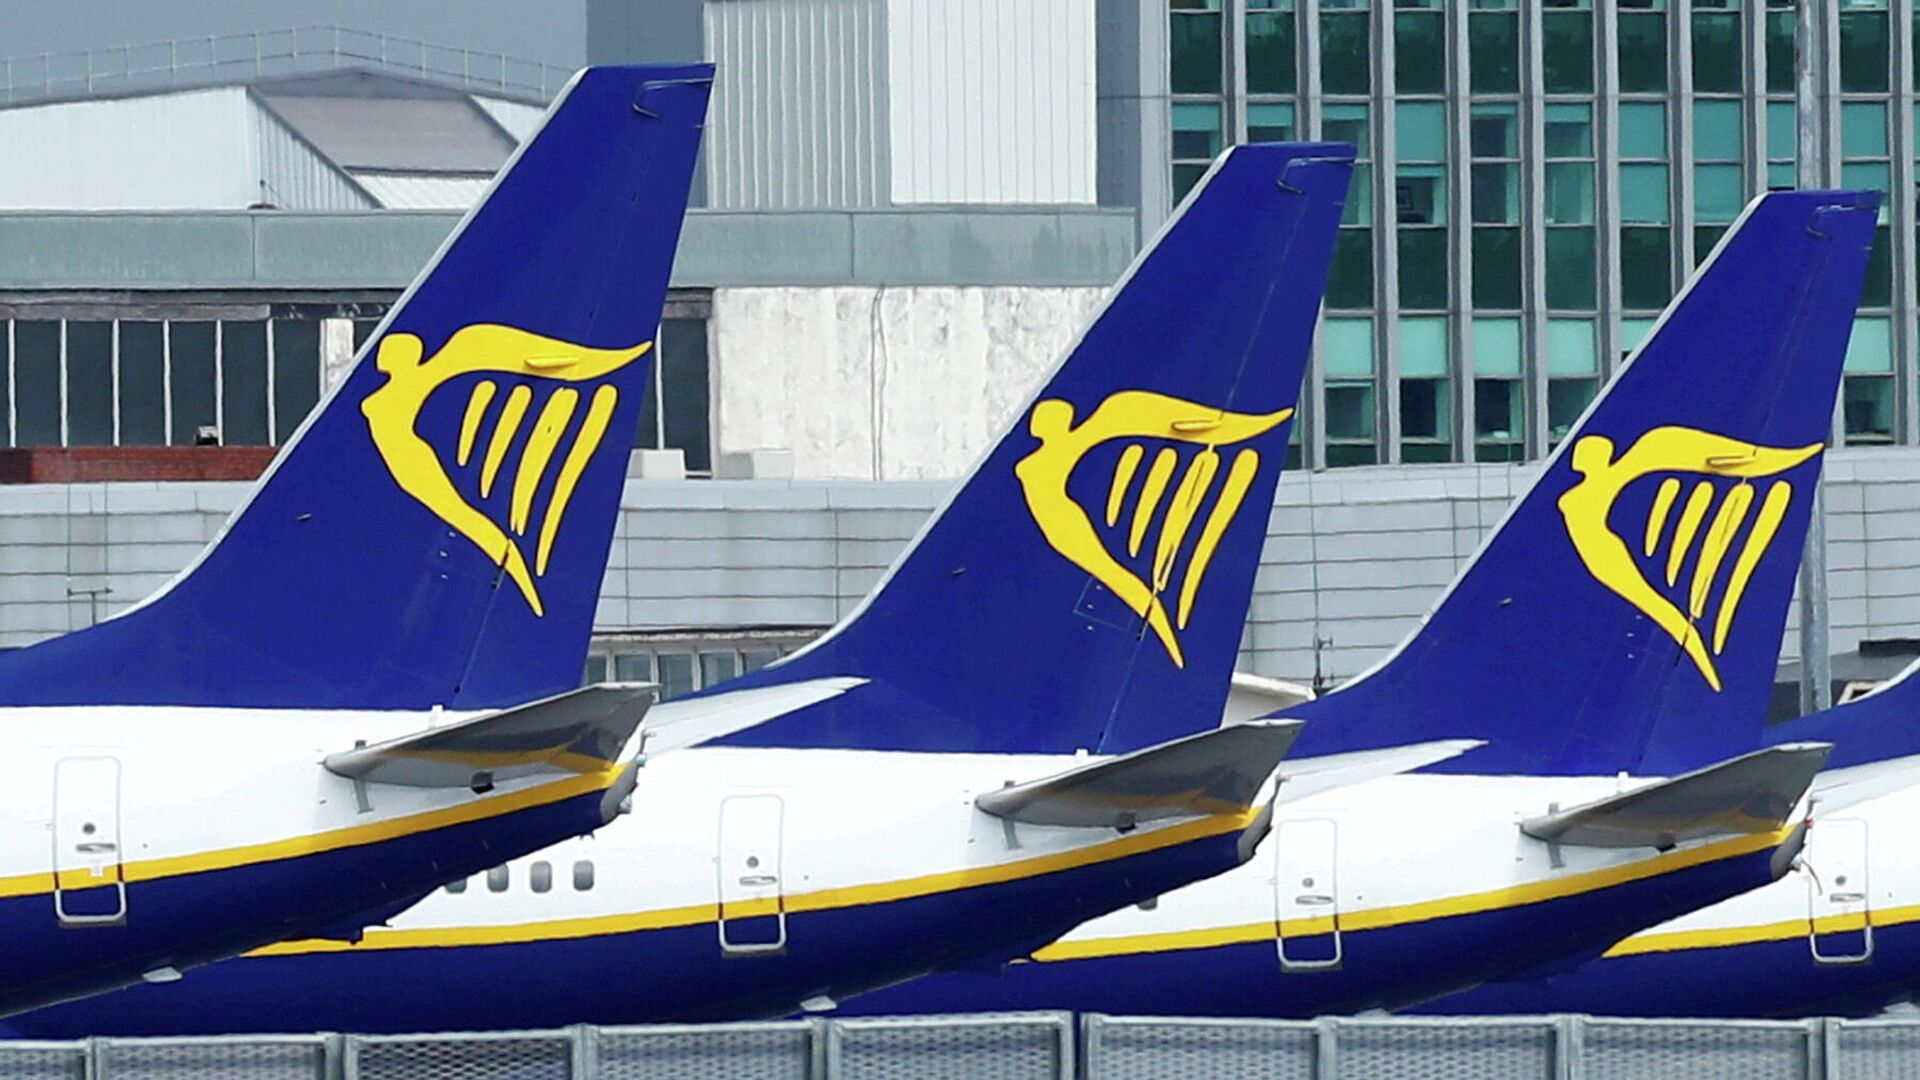 Ryanair, el aerolínea irlandesa  - Sputnik Mundo, 1920, 28.05.2021